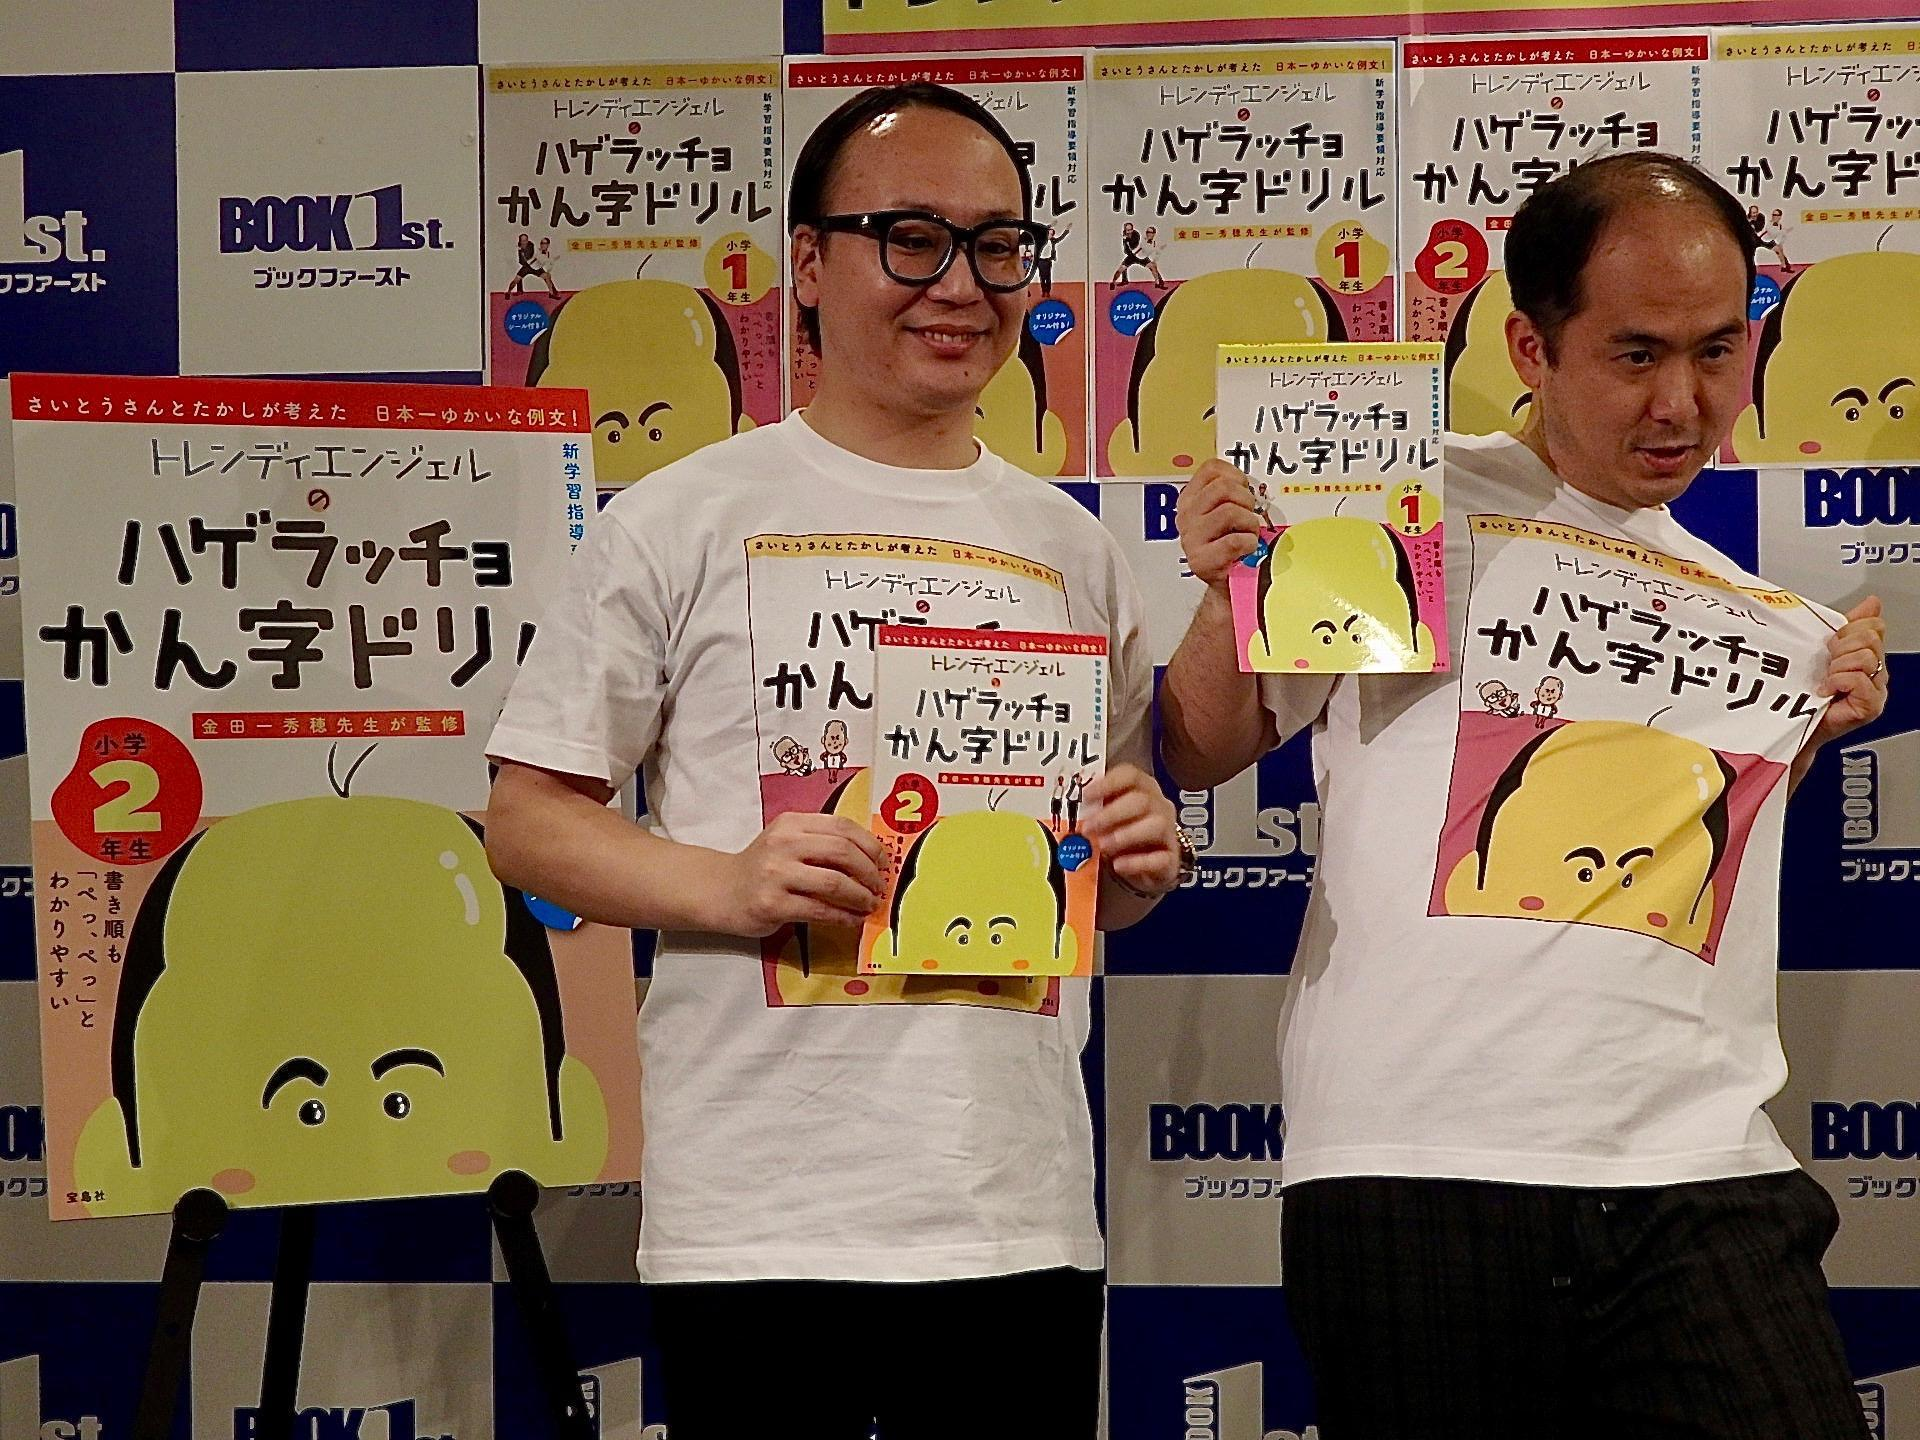 http://news.yoshimoto.co.jp/20180412000620-fd3fd3435a308e805f20874a5c30c2546755921f.jpg